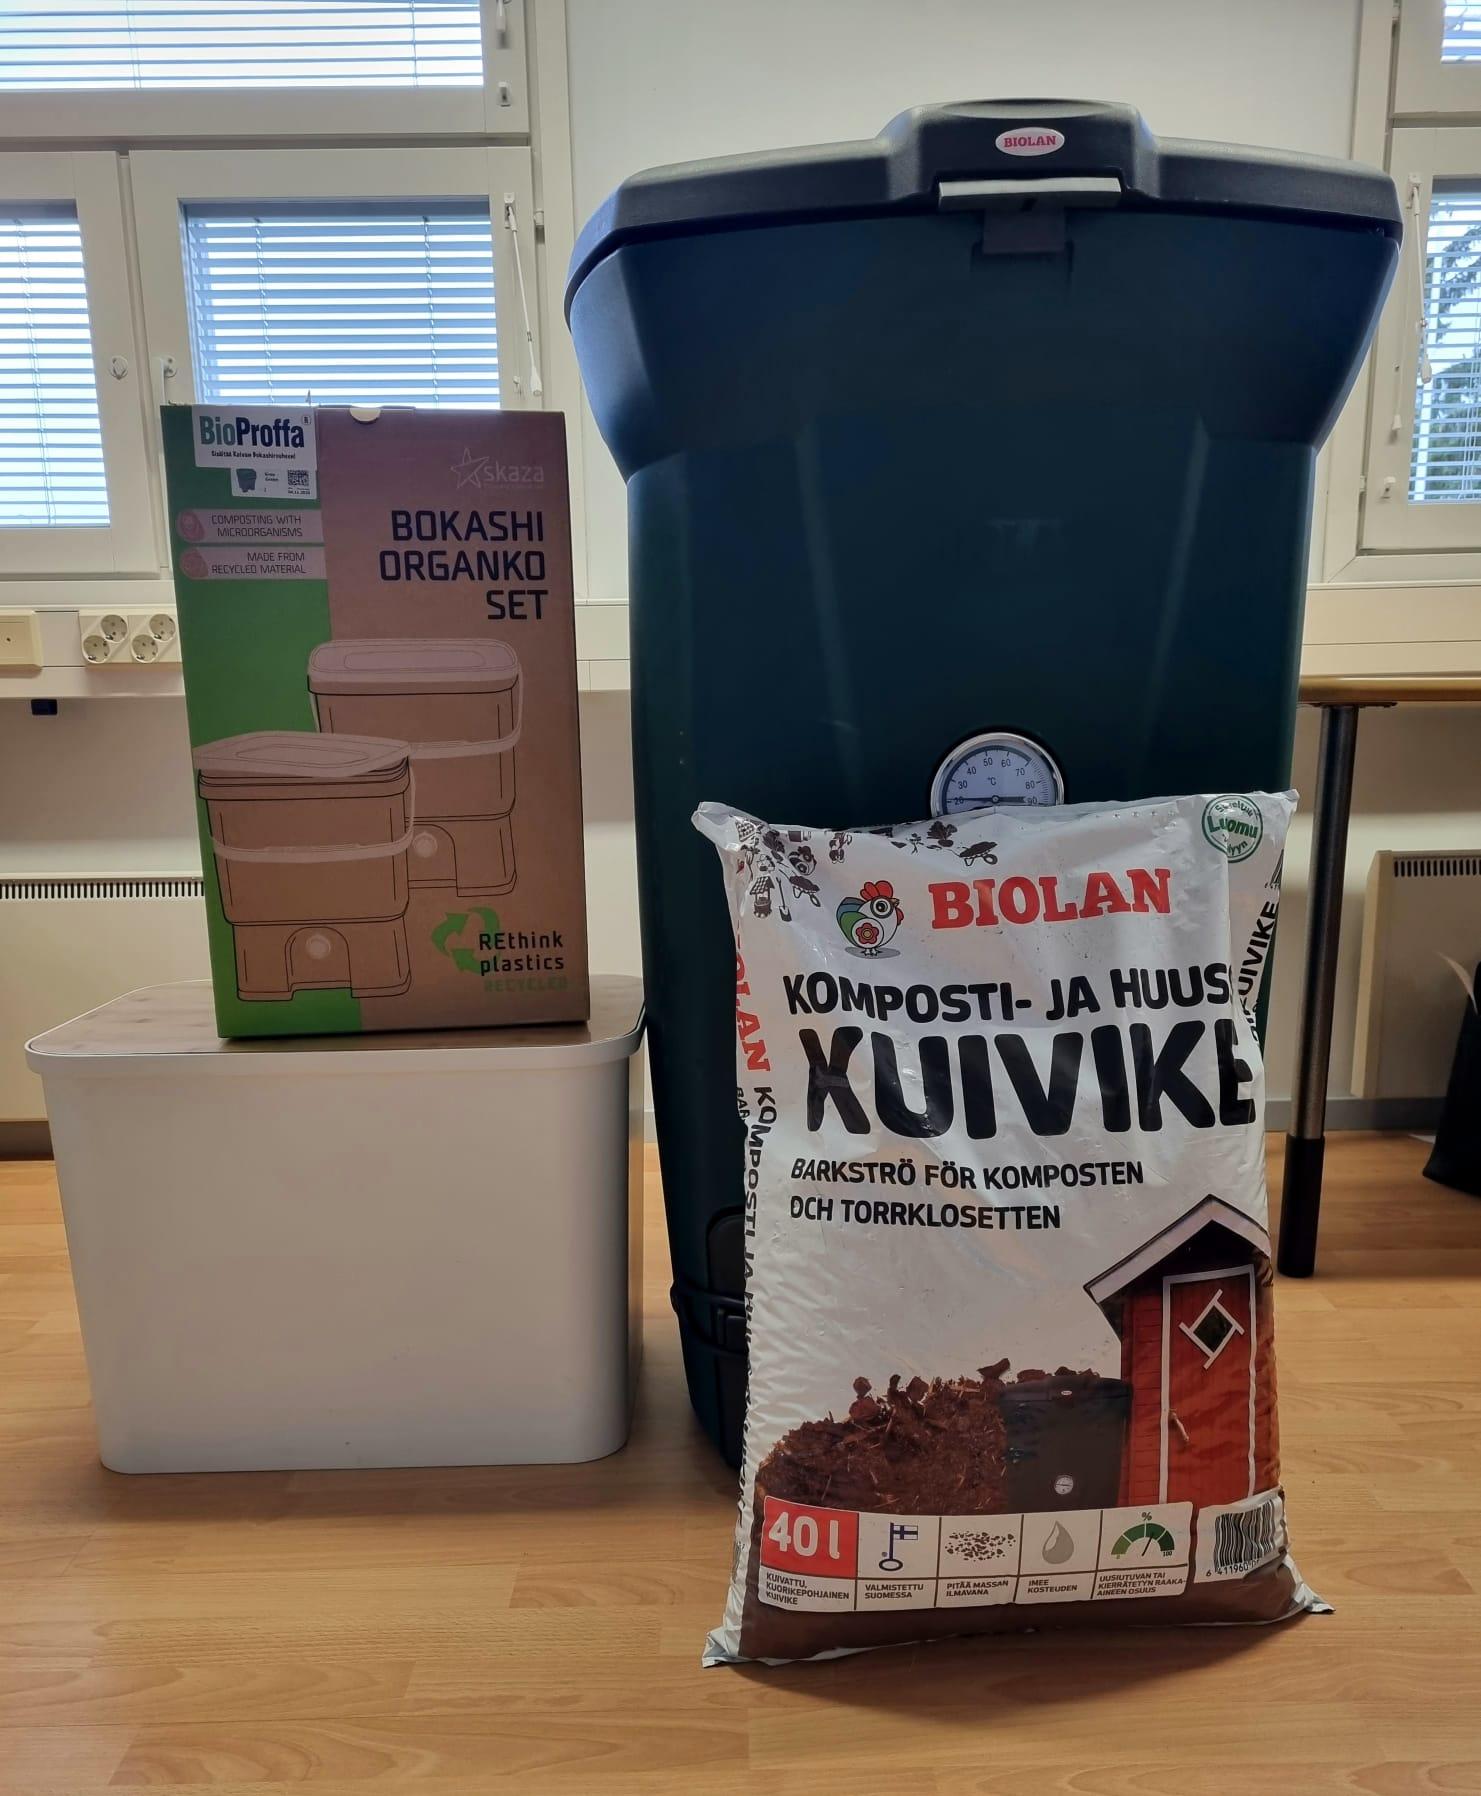 Kompostin palkinnot